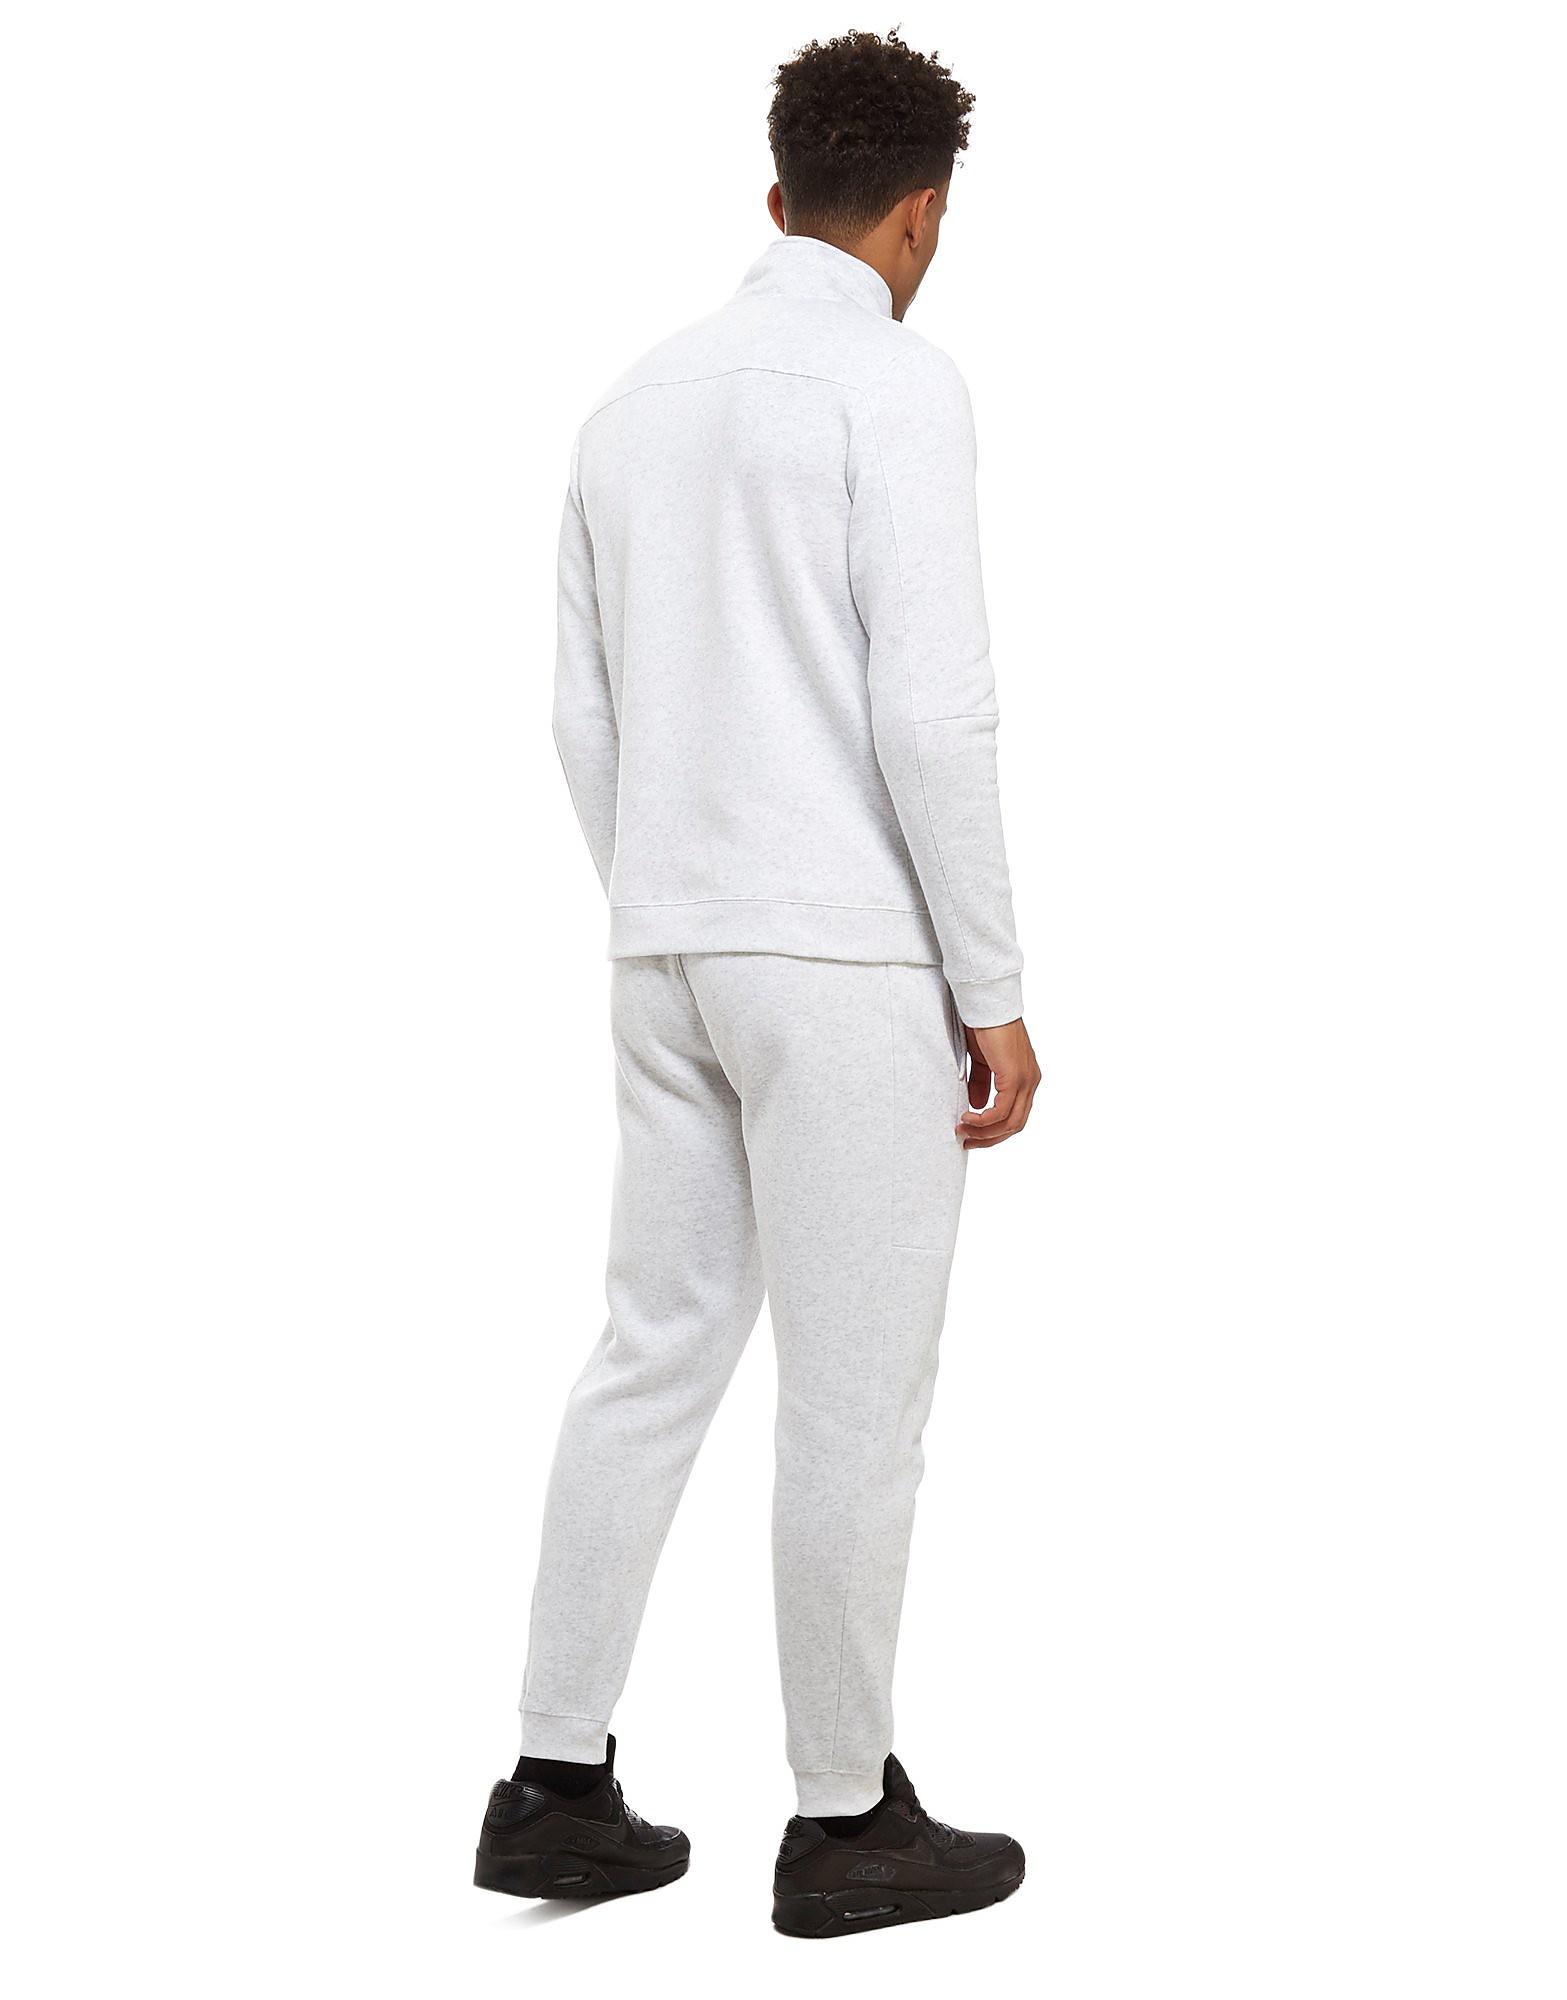 Nike Season 2 Fleece Tracksuit